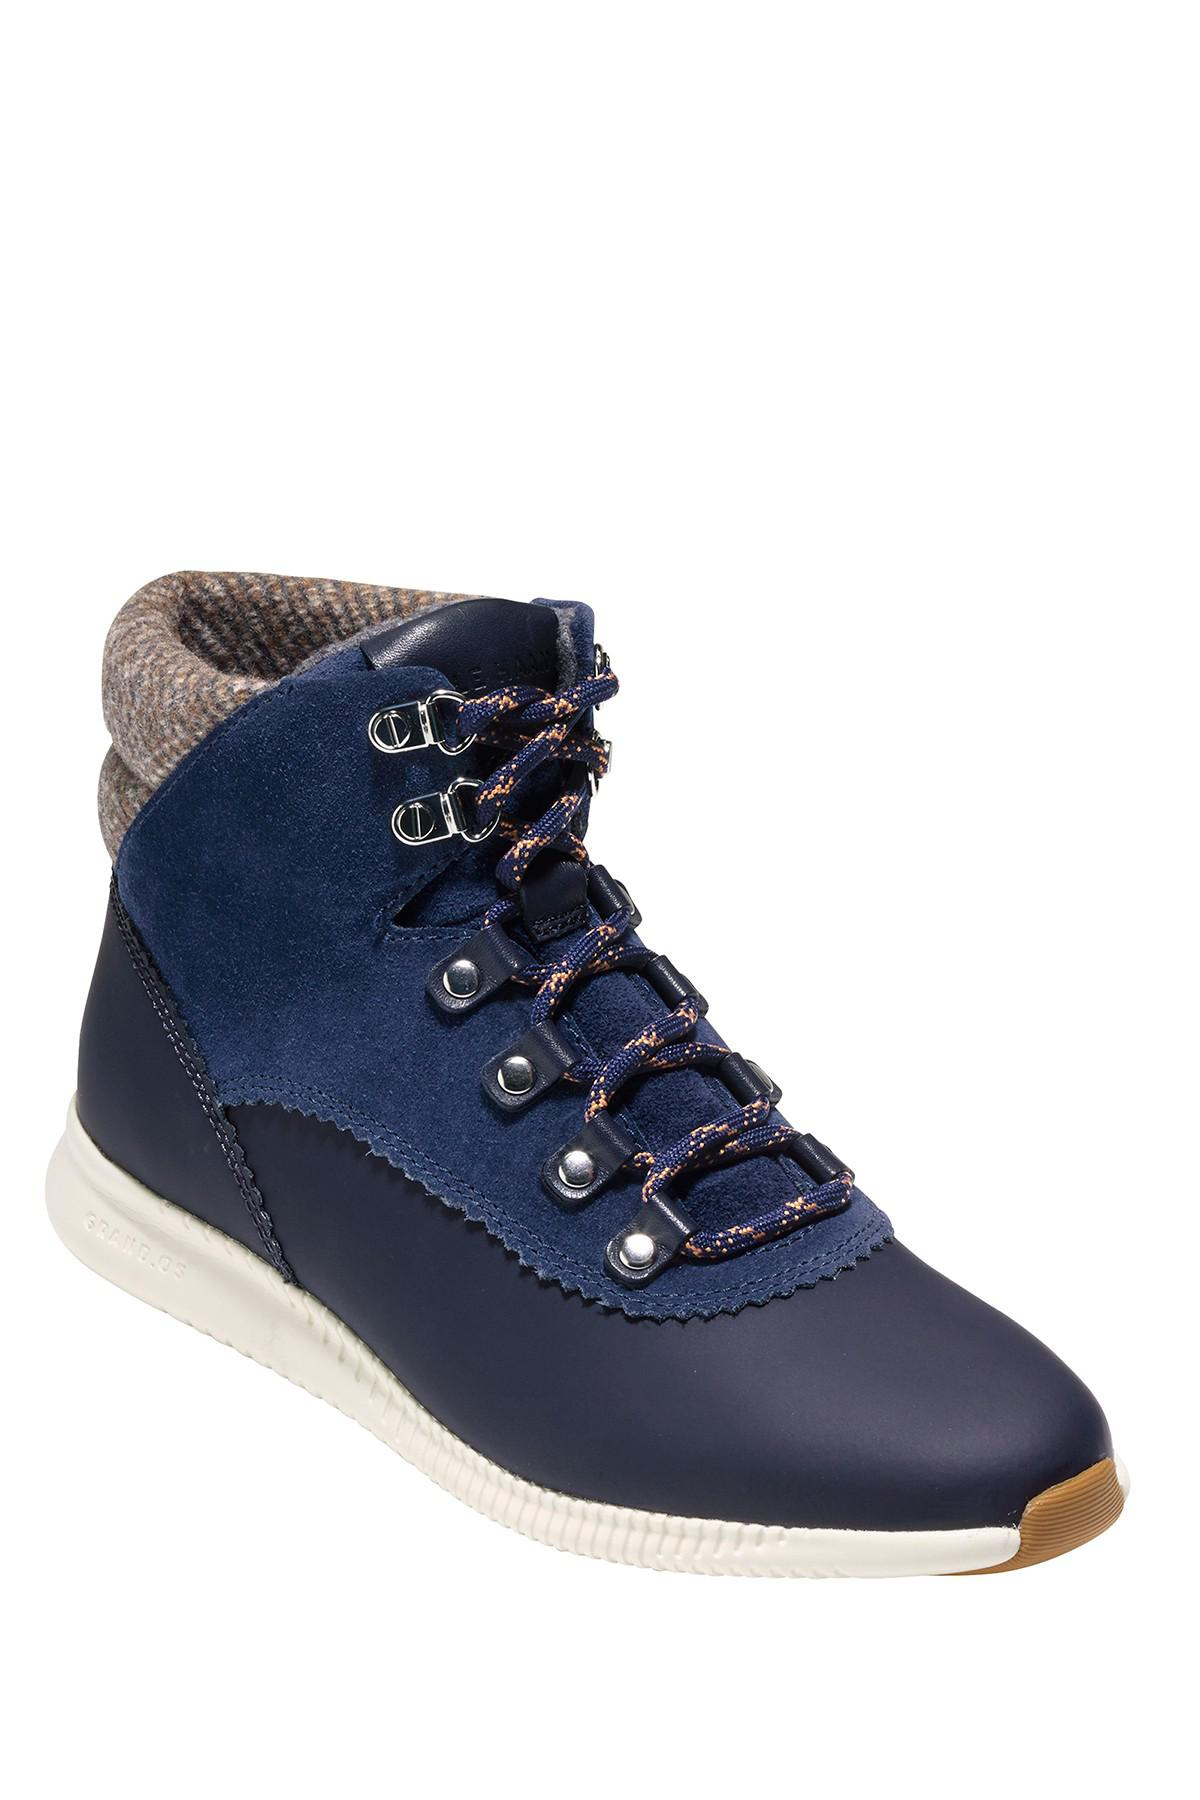 7410417fc3042 Lyst - Cole Haan Zerogrand Waterproof Hiking Boot in Blue